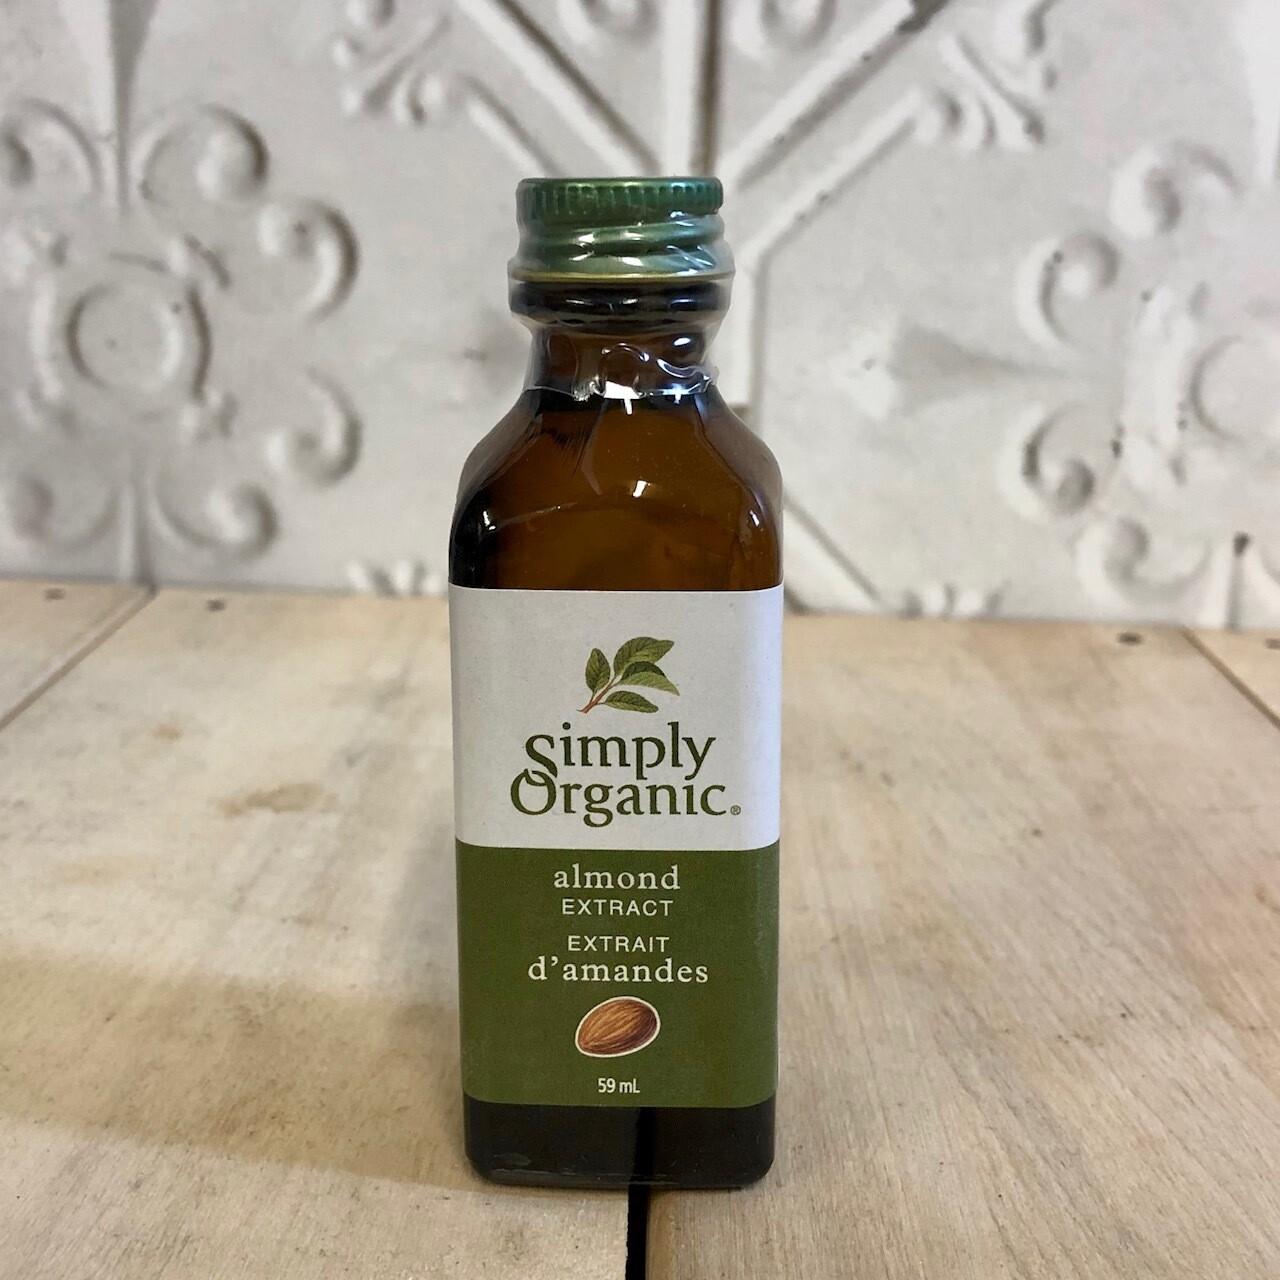 SIMPLY ORGANIC Almond Extract 59ml